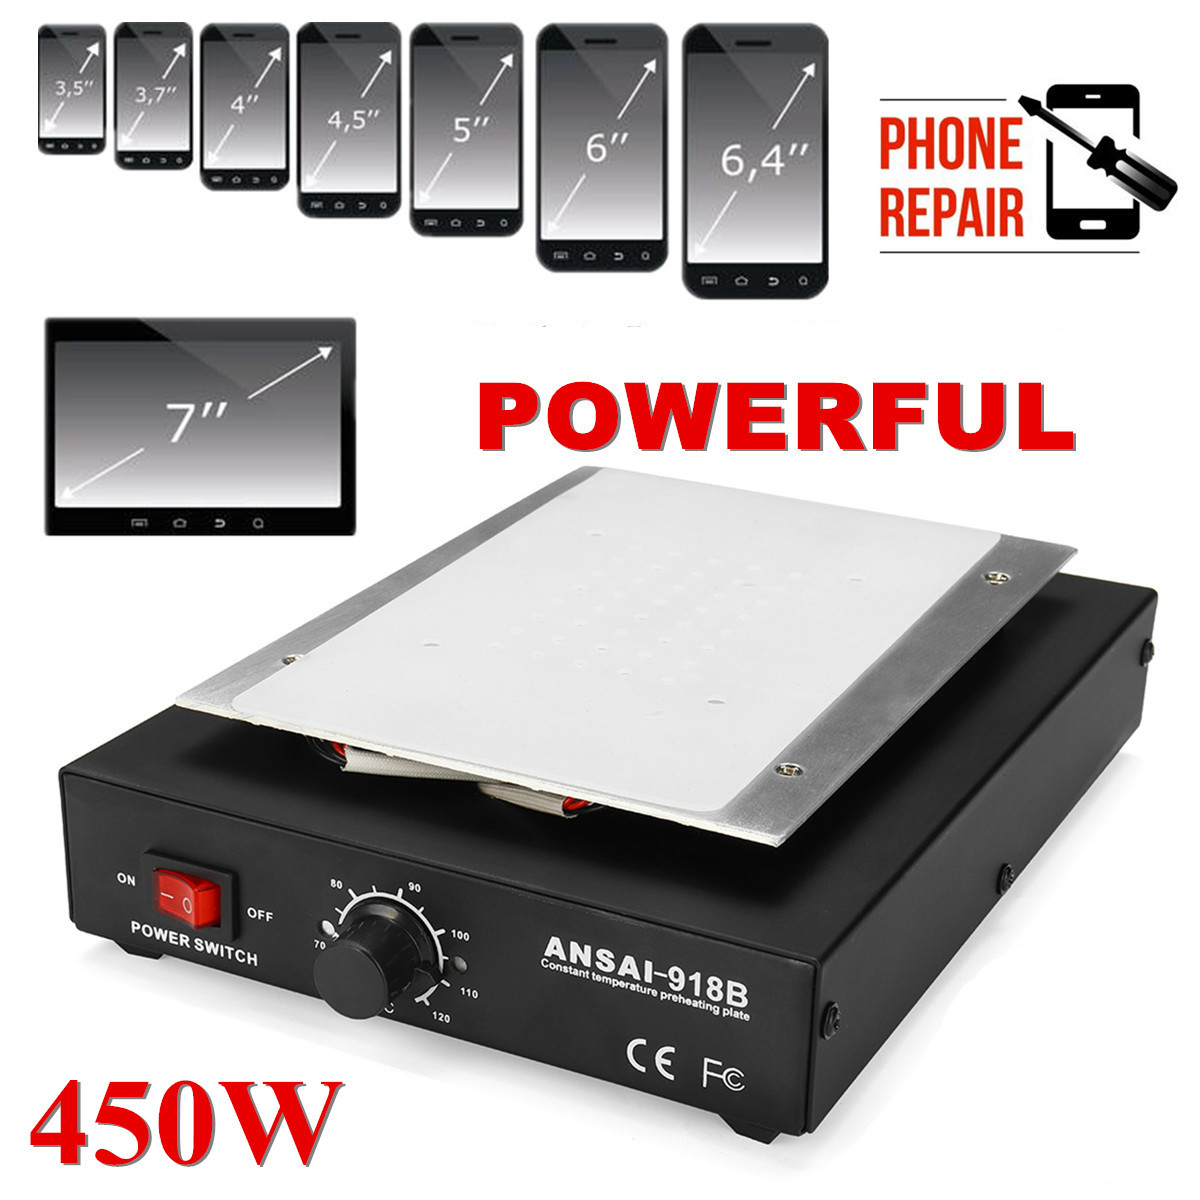 450W Screen Separator Auto Heating Metal Phone Repair Machine Glass Removal Heating Platform Plate LCD Screen Separators